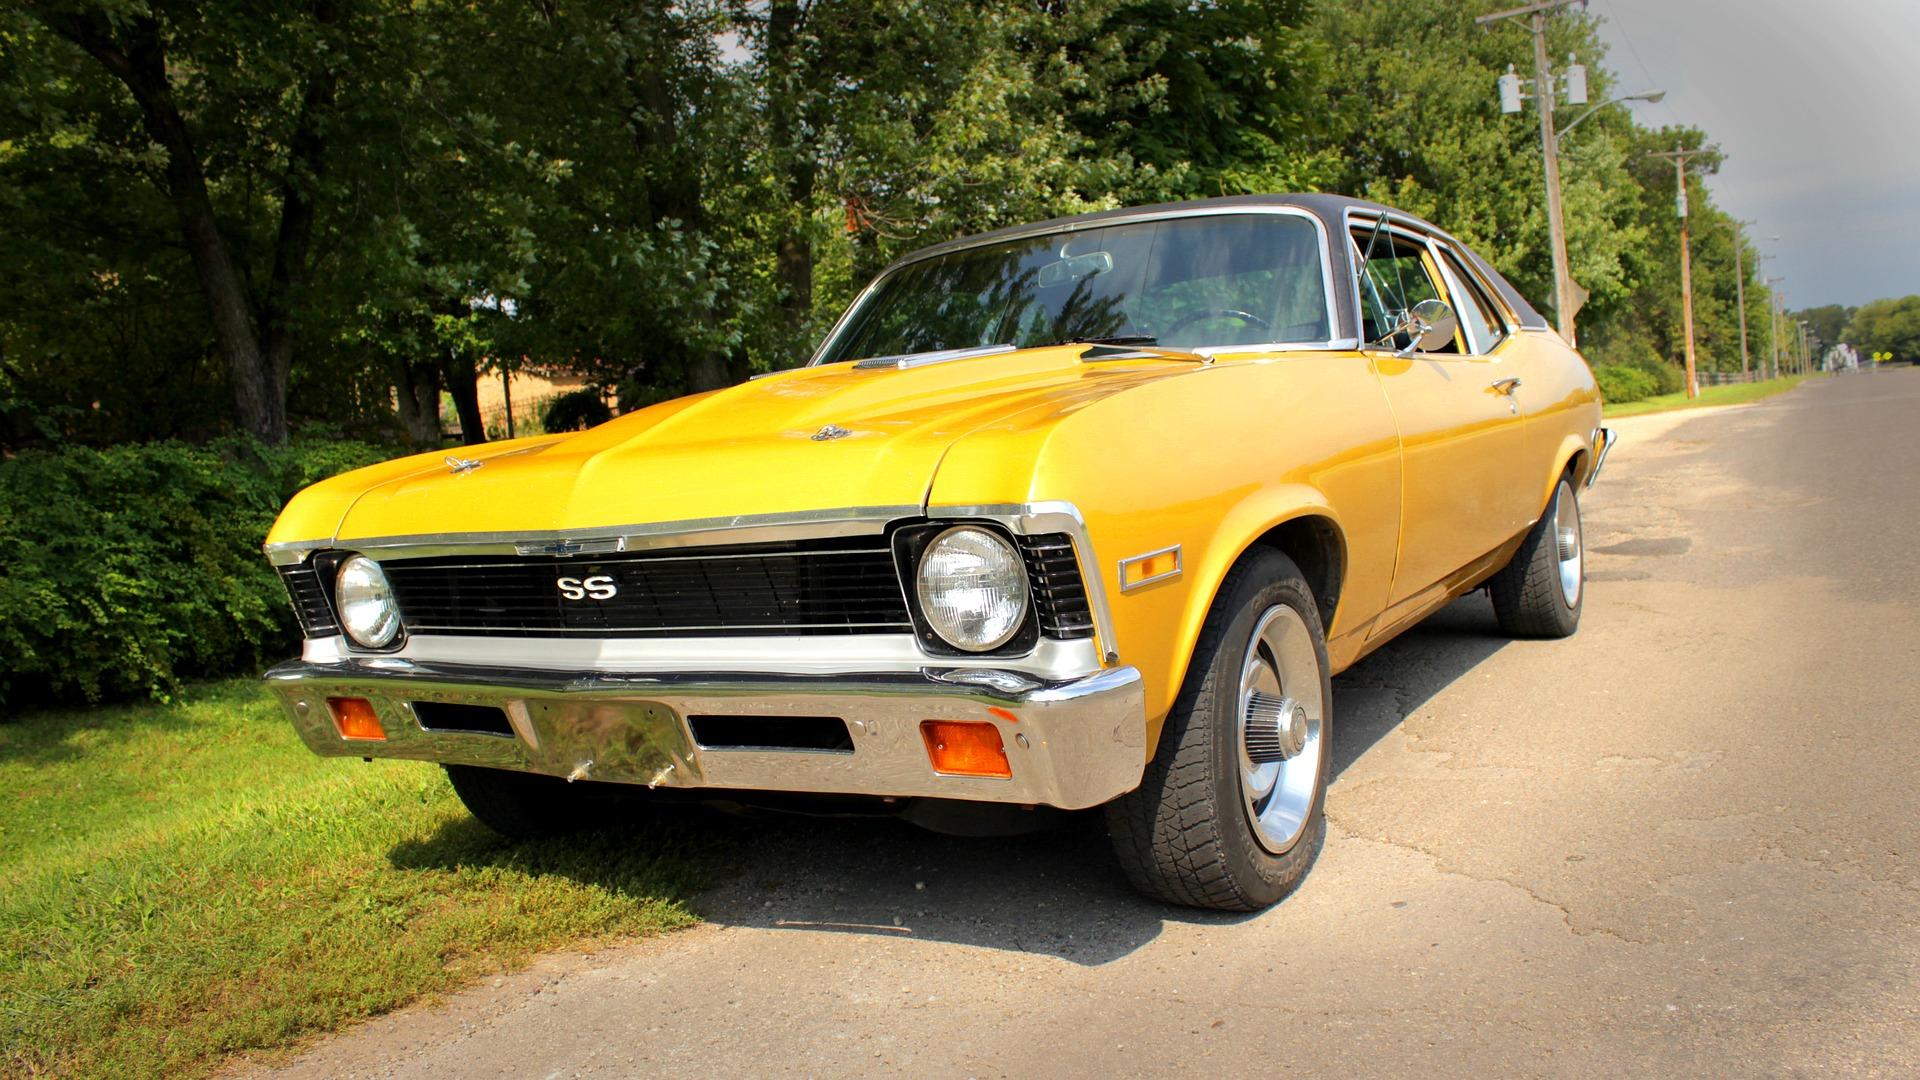 Yellow Car roadside